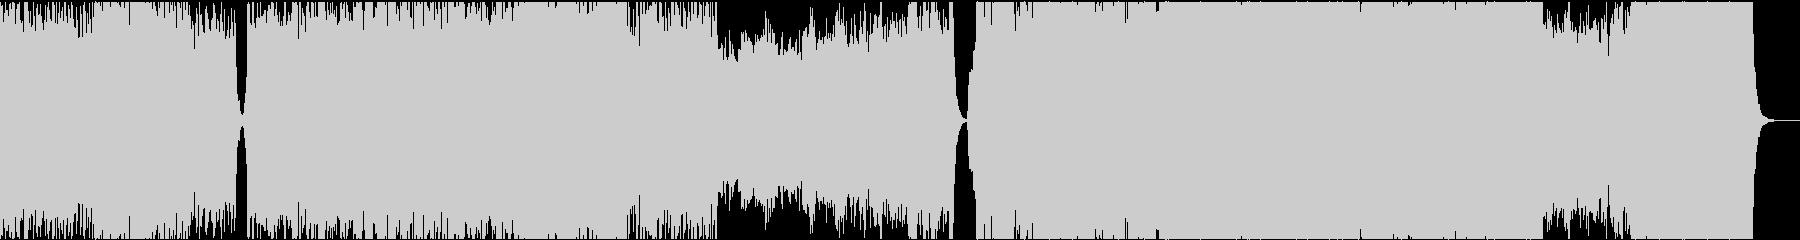 16bit48kHzバージョンの未再生の波形